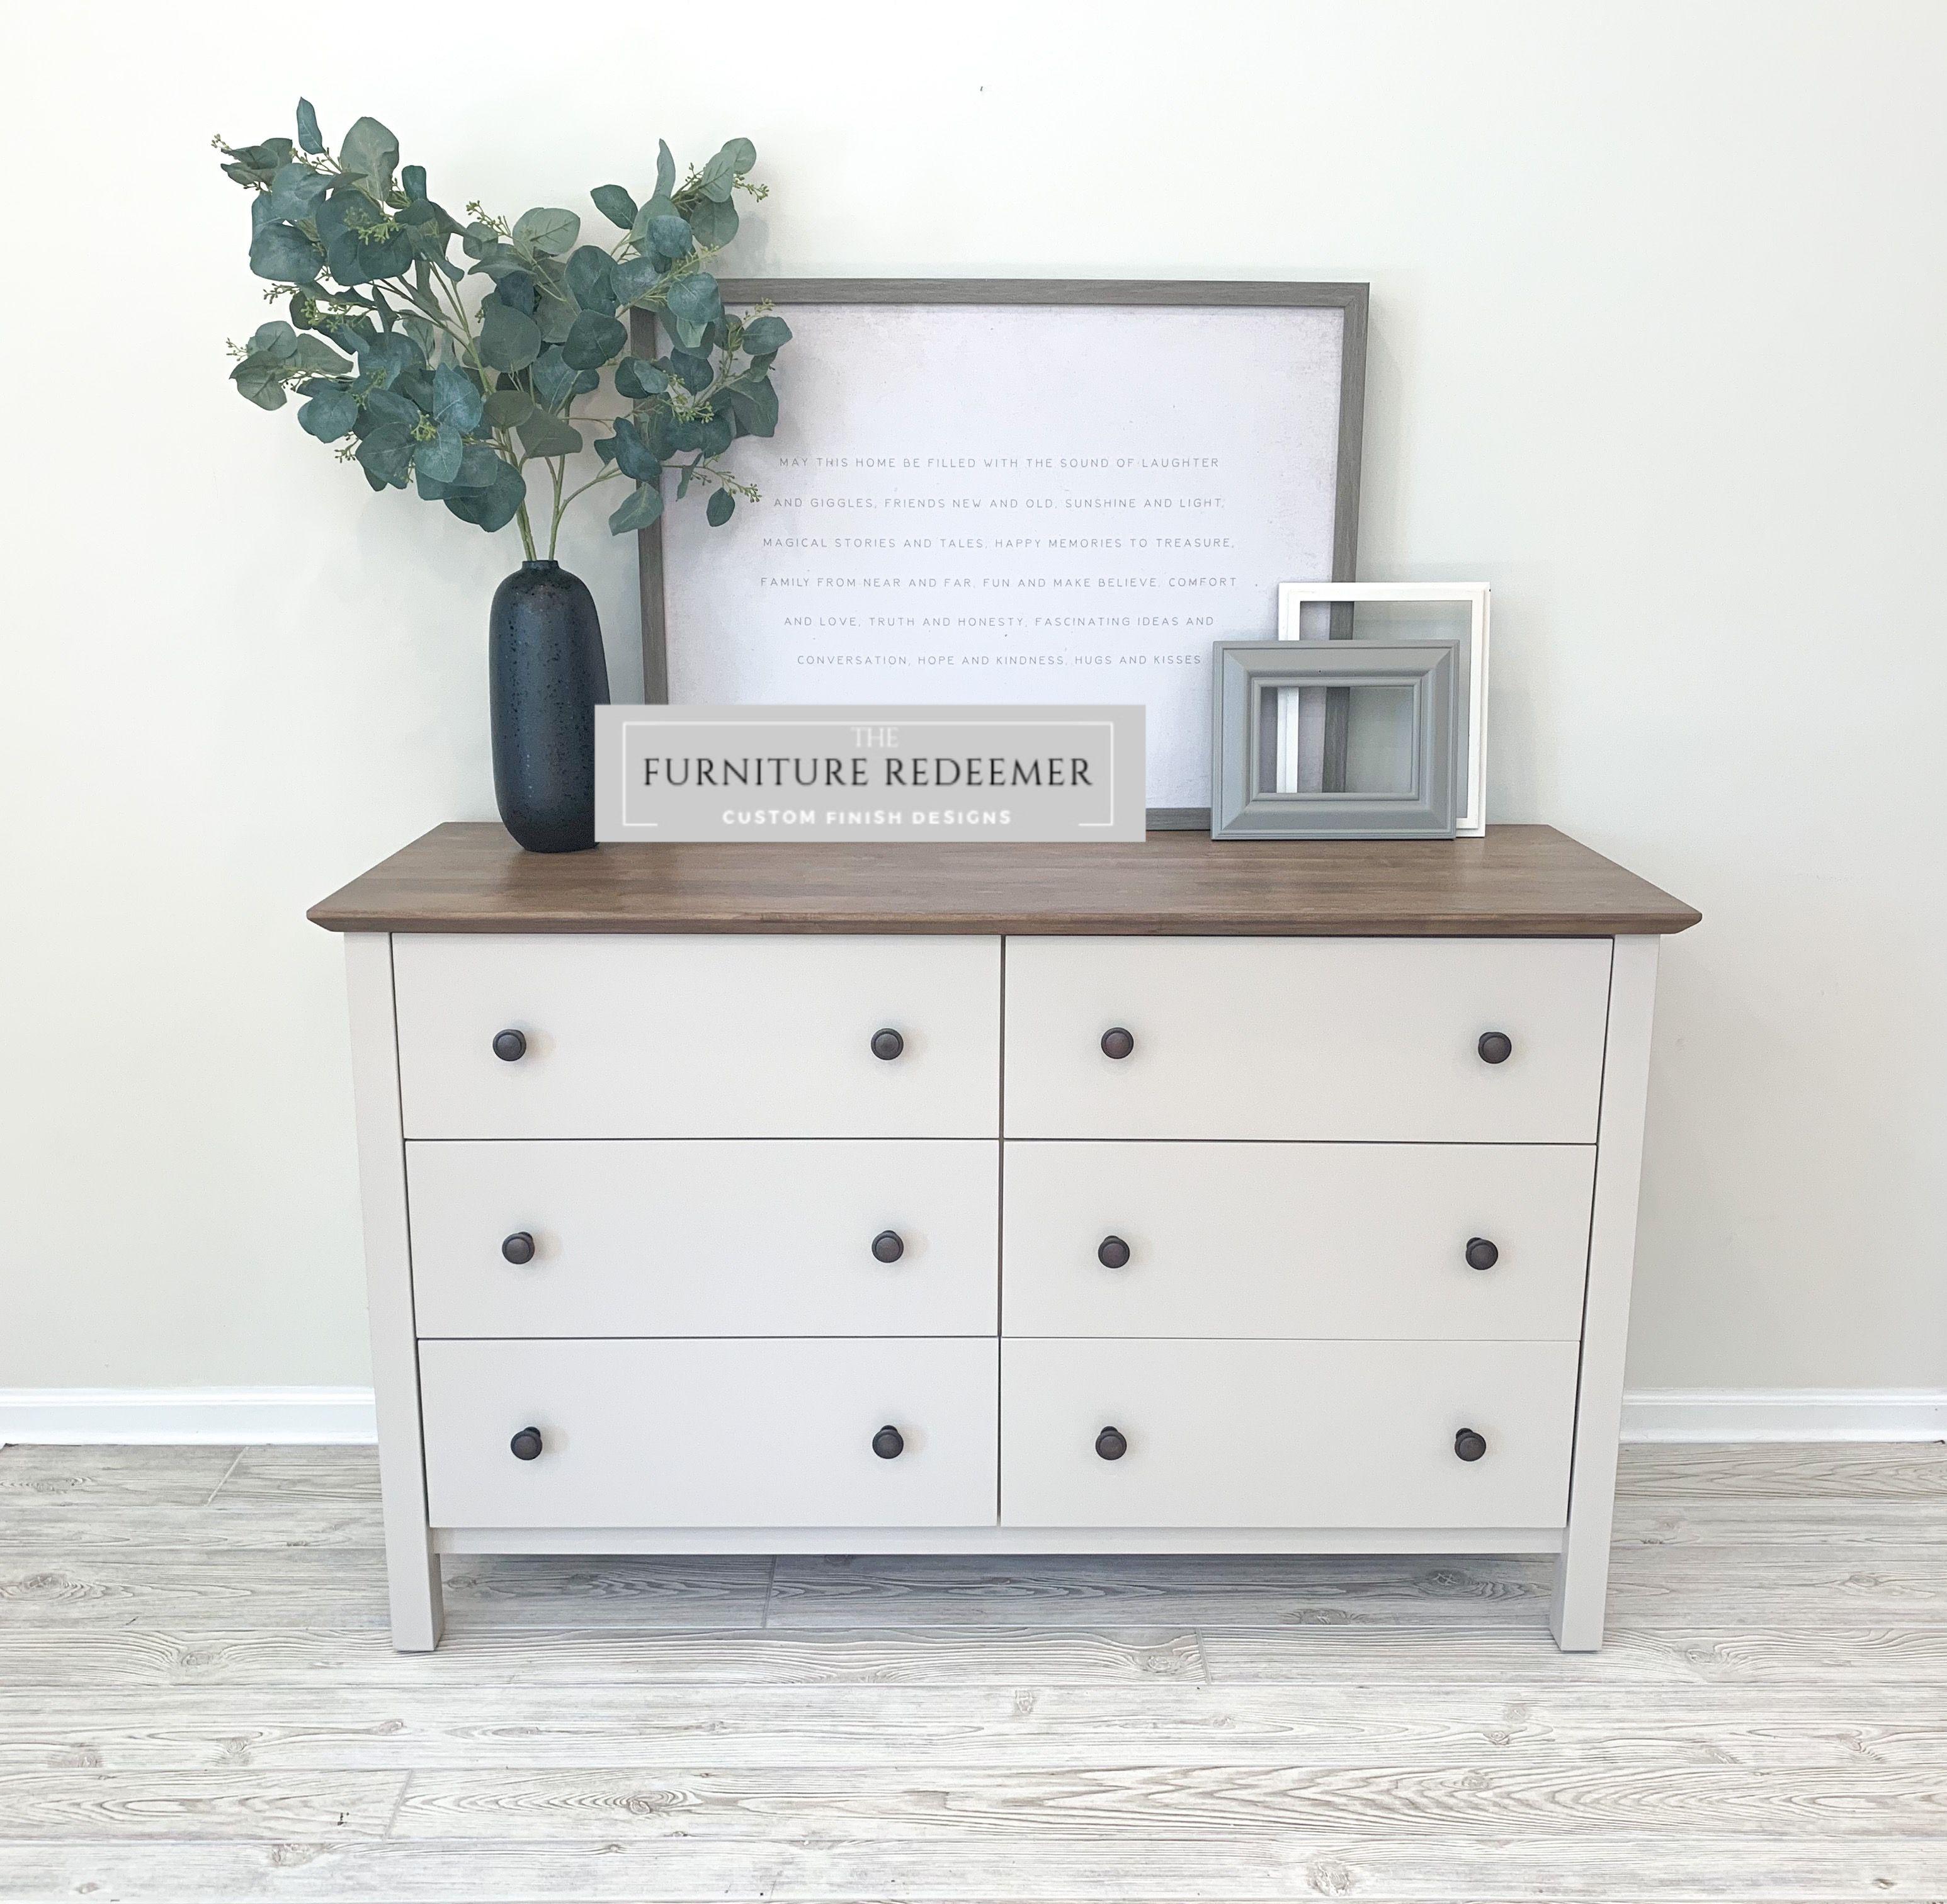 Farmhouse 6 Drawer Dresser White Stained Dresser White Dresser Decor Dresser Makeover White [ 3024 x 3092 Pixel ]